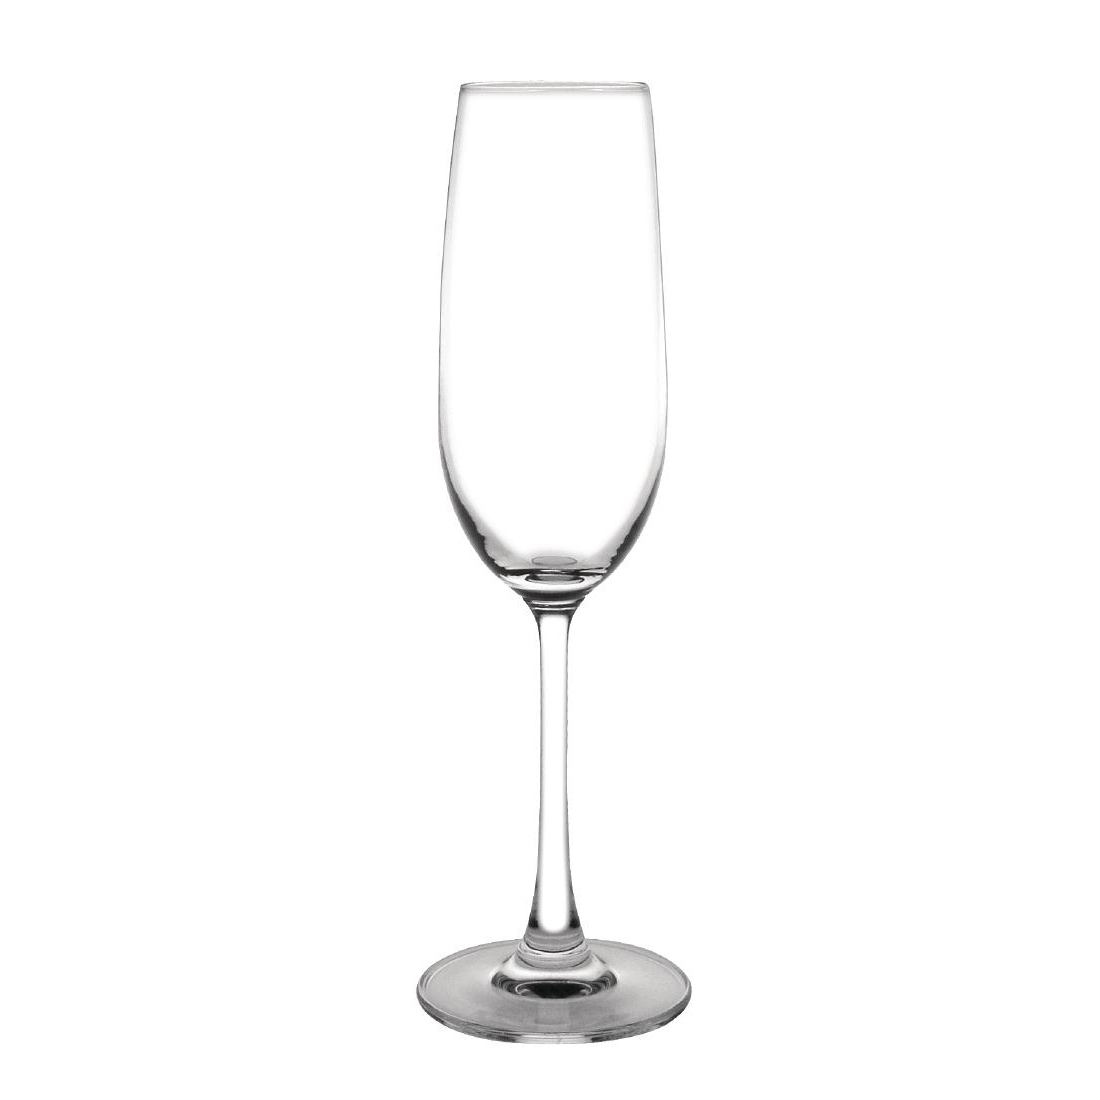 Flûte cristal Modale Olympia 215ml par 6